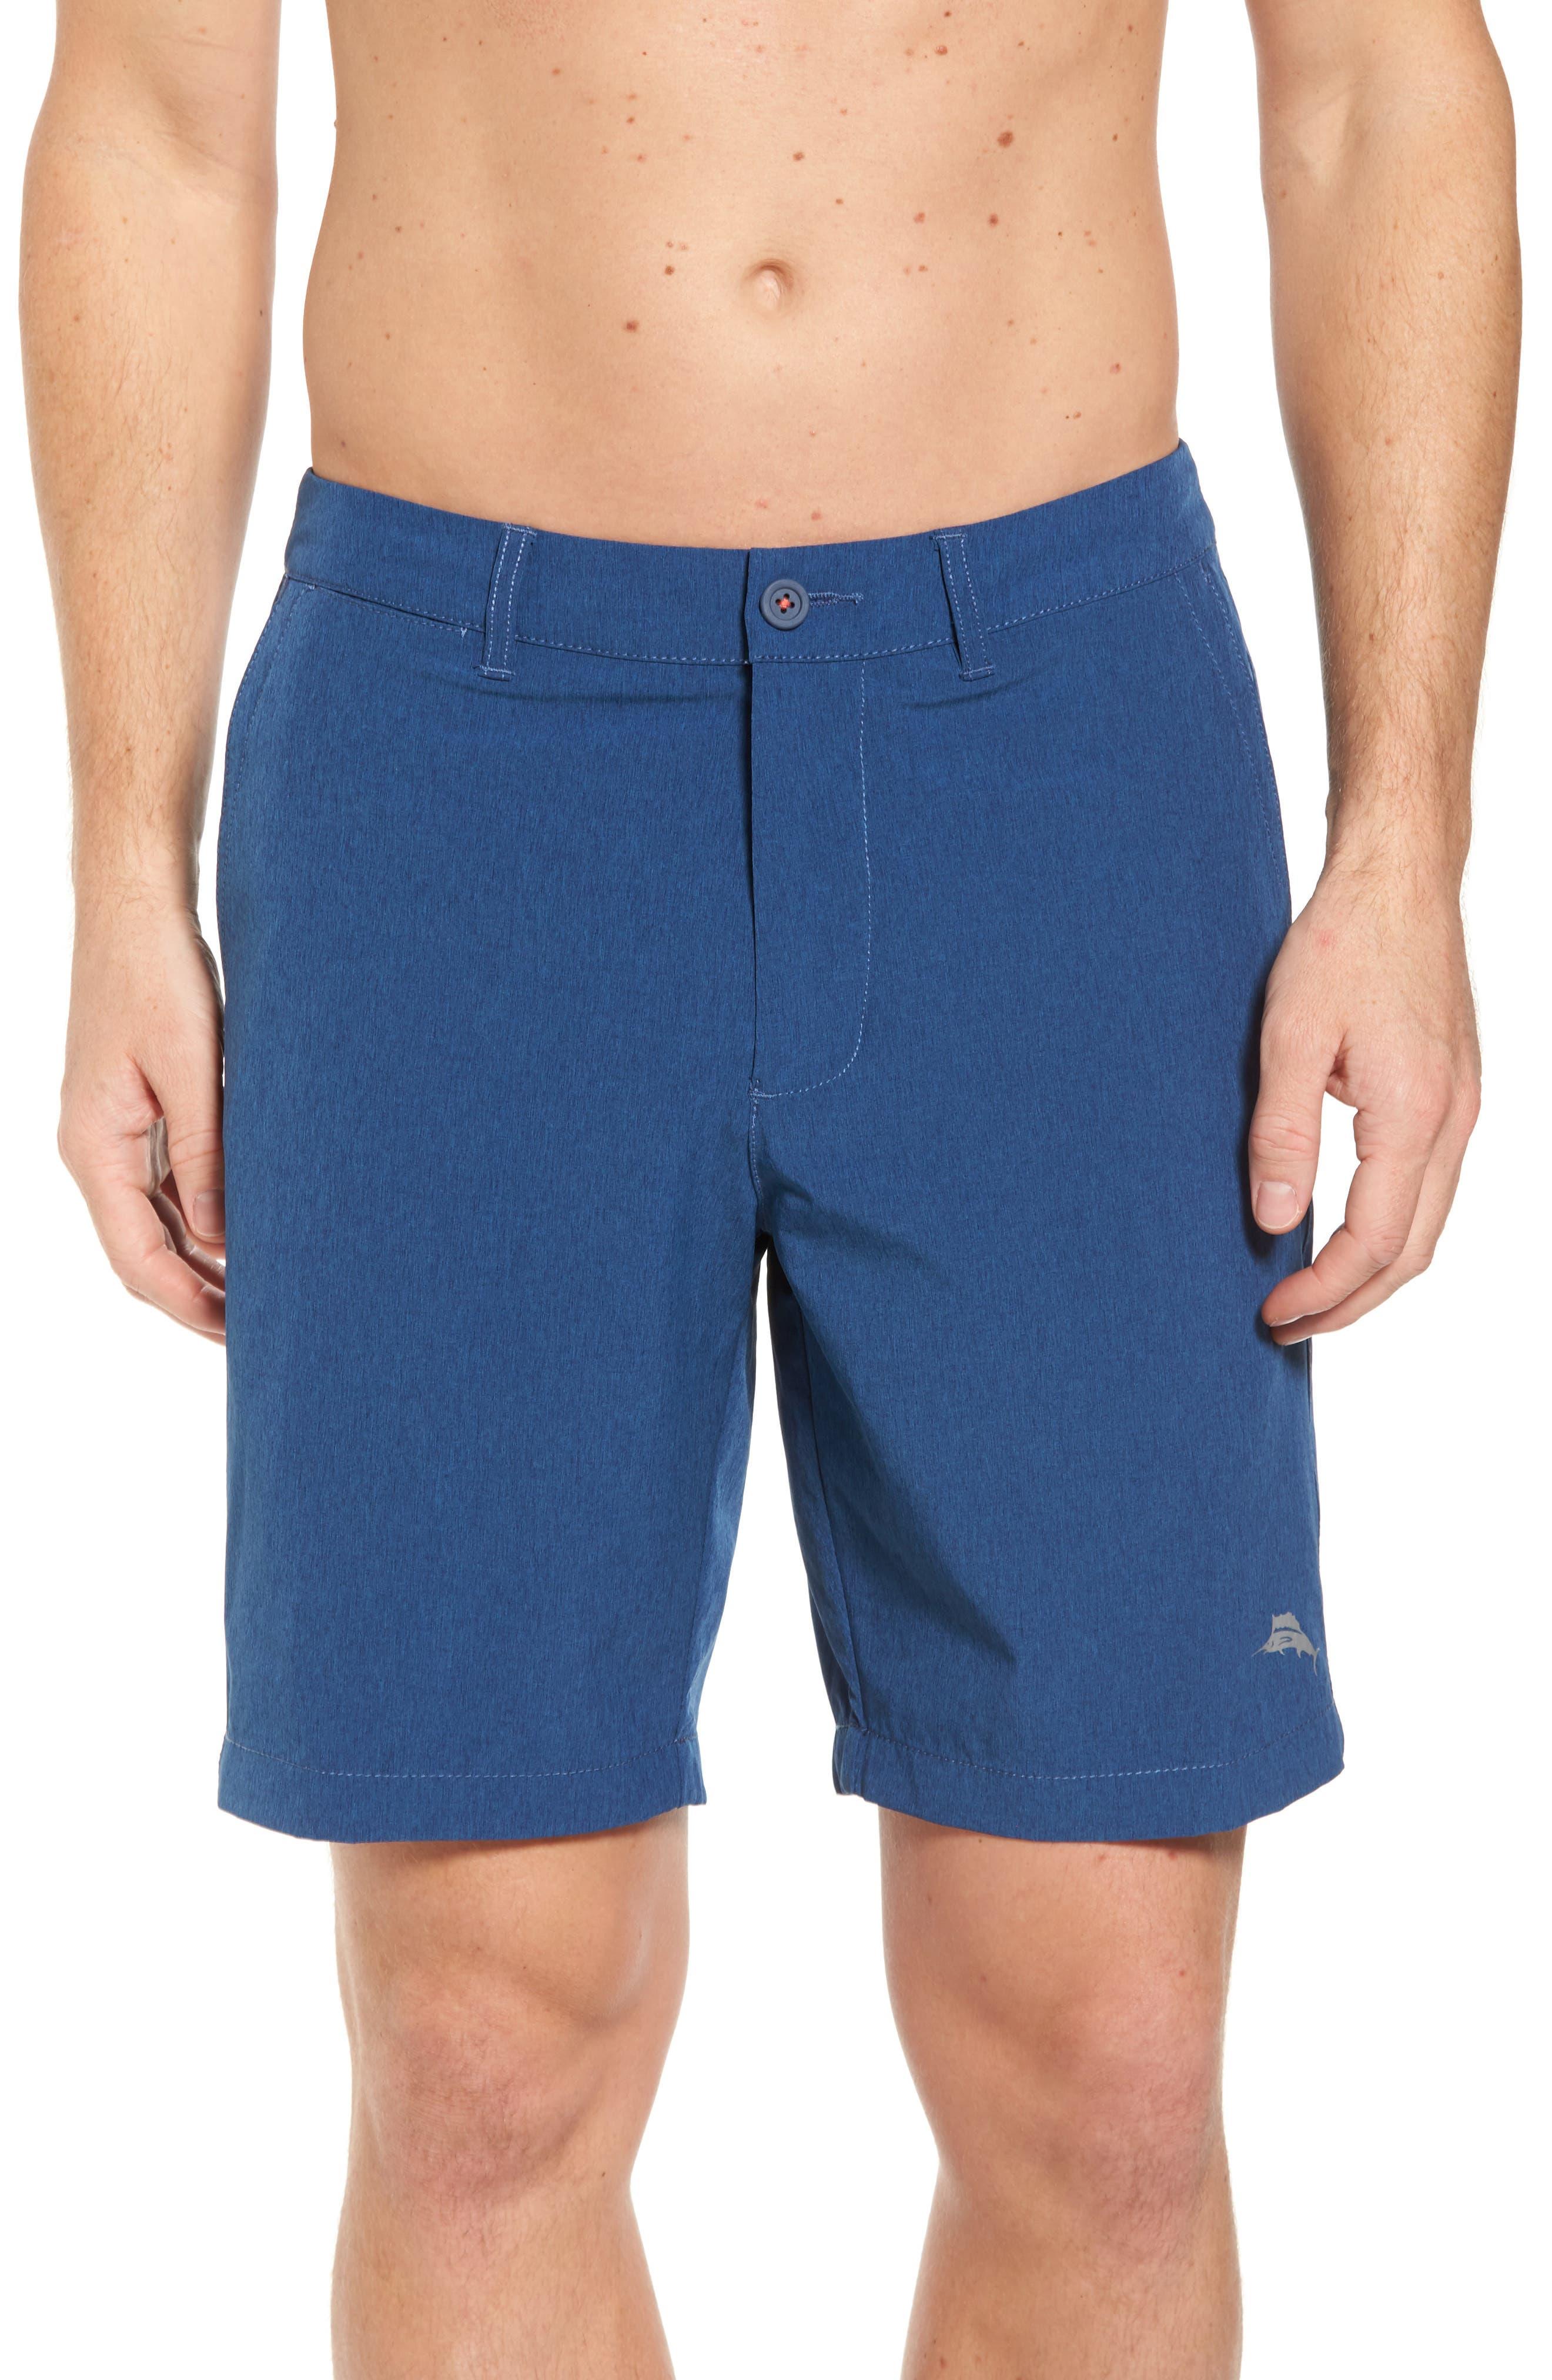 Tommy Bahama 'Cayman Isles' Hybrid Swim Shorts